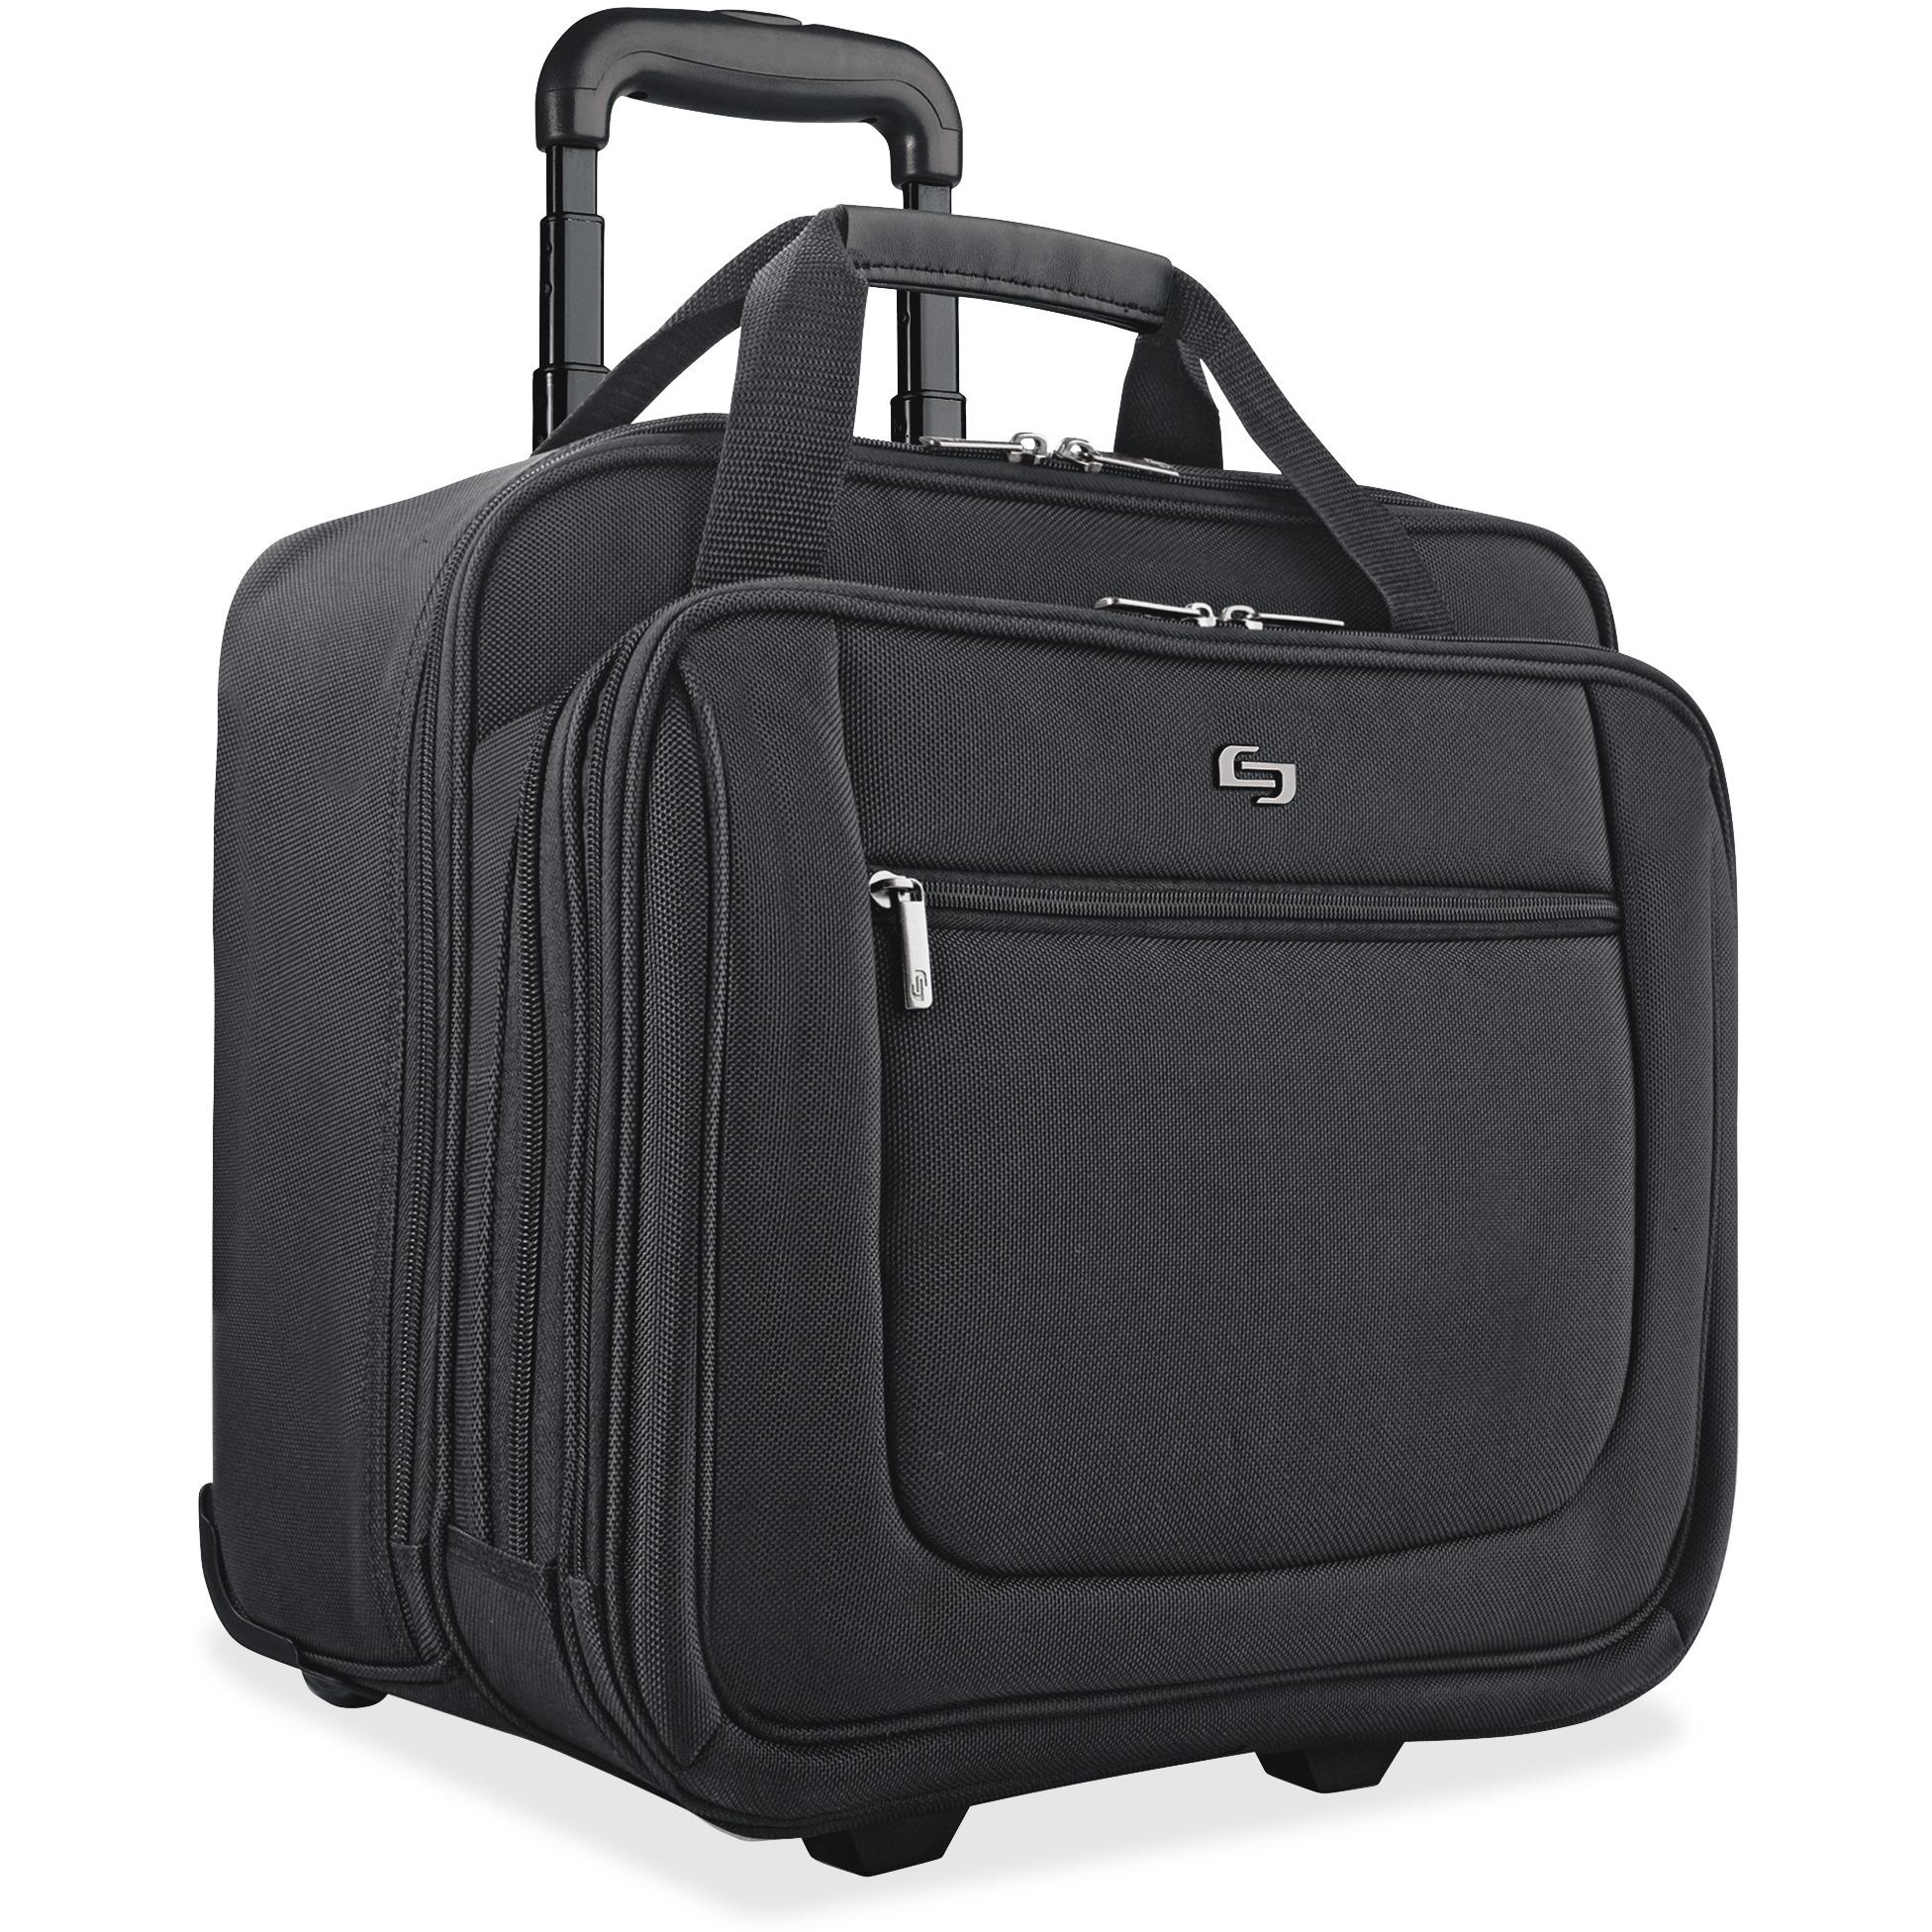 Solo, USLPT1364, US Luggage Classic Rolling Laptop Portfolio Case, 1, Black